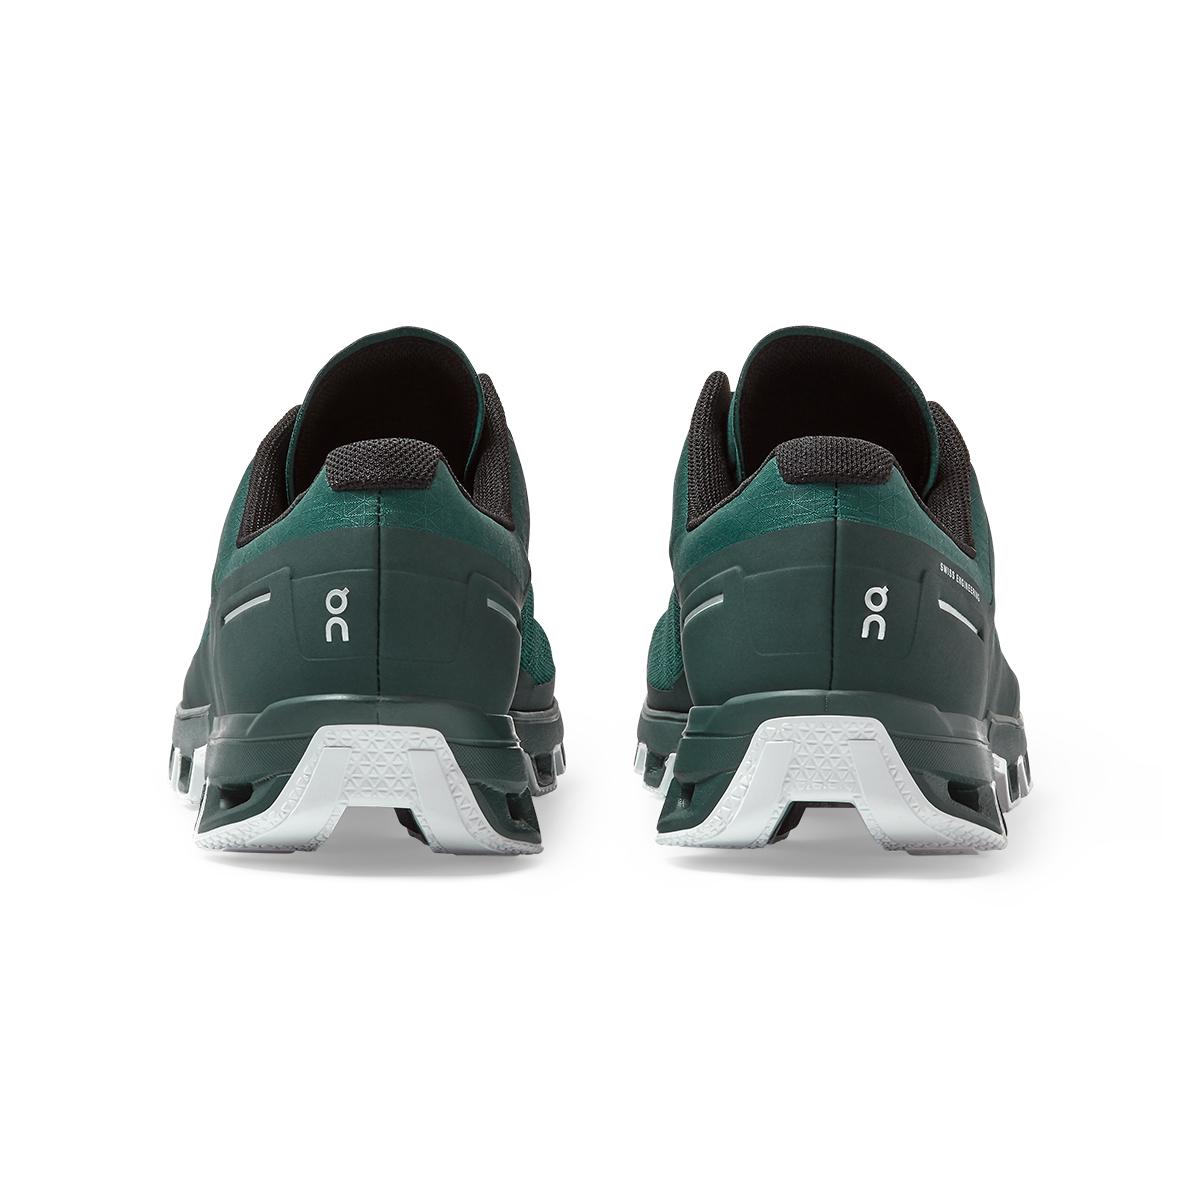 Men's On Cloudventure Running Shoe - Color: Evergreen/White - Size: 7 - Width: Regular, Evergreen/White, large, image 4